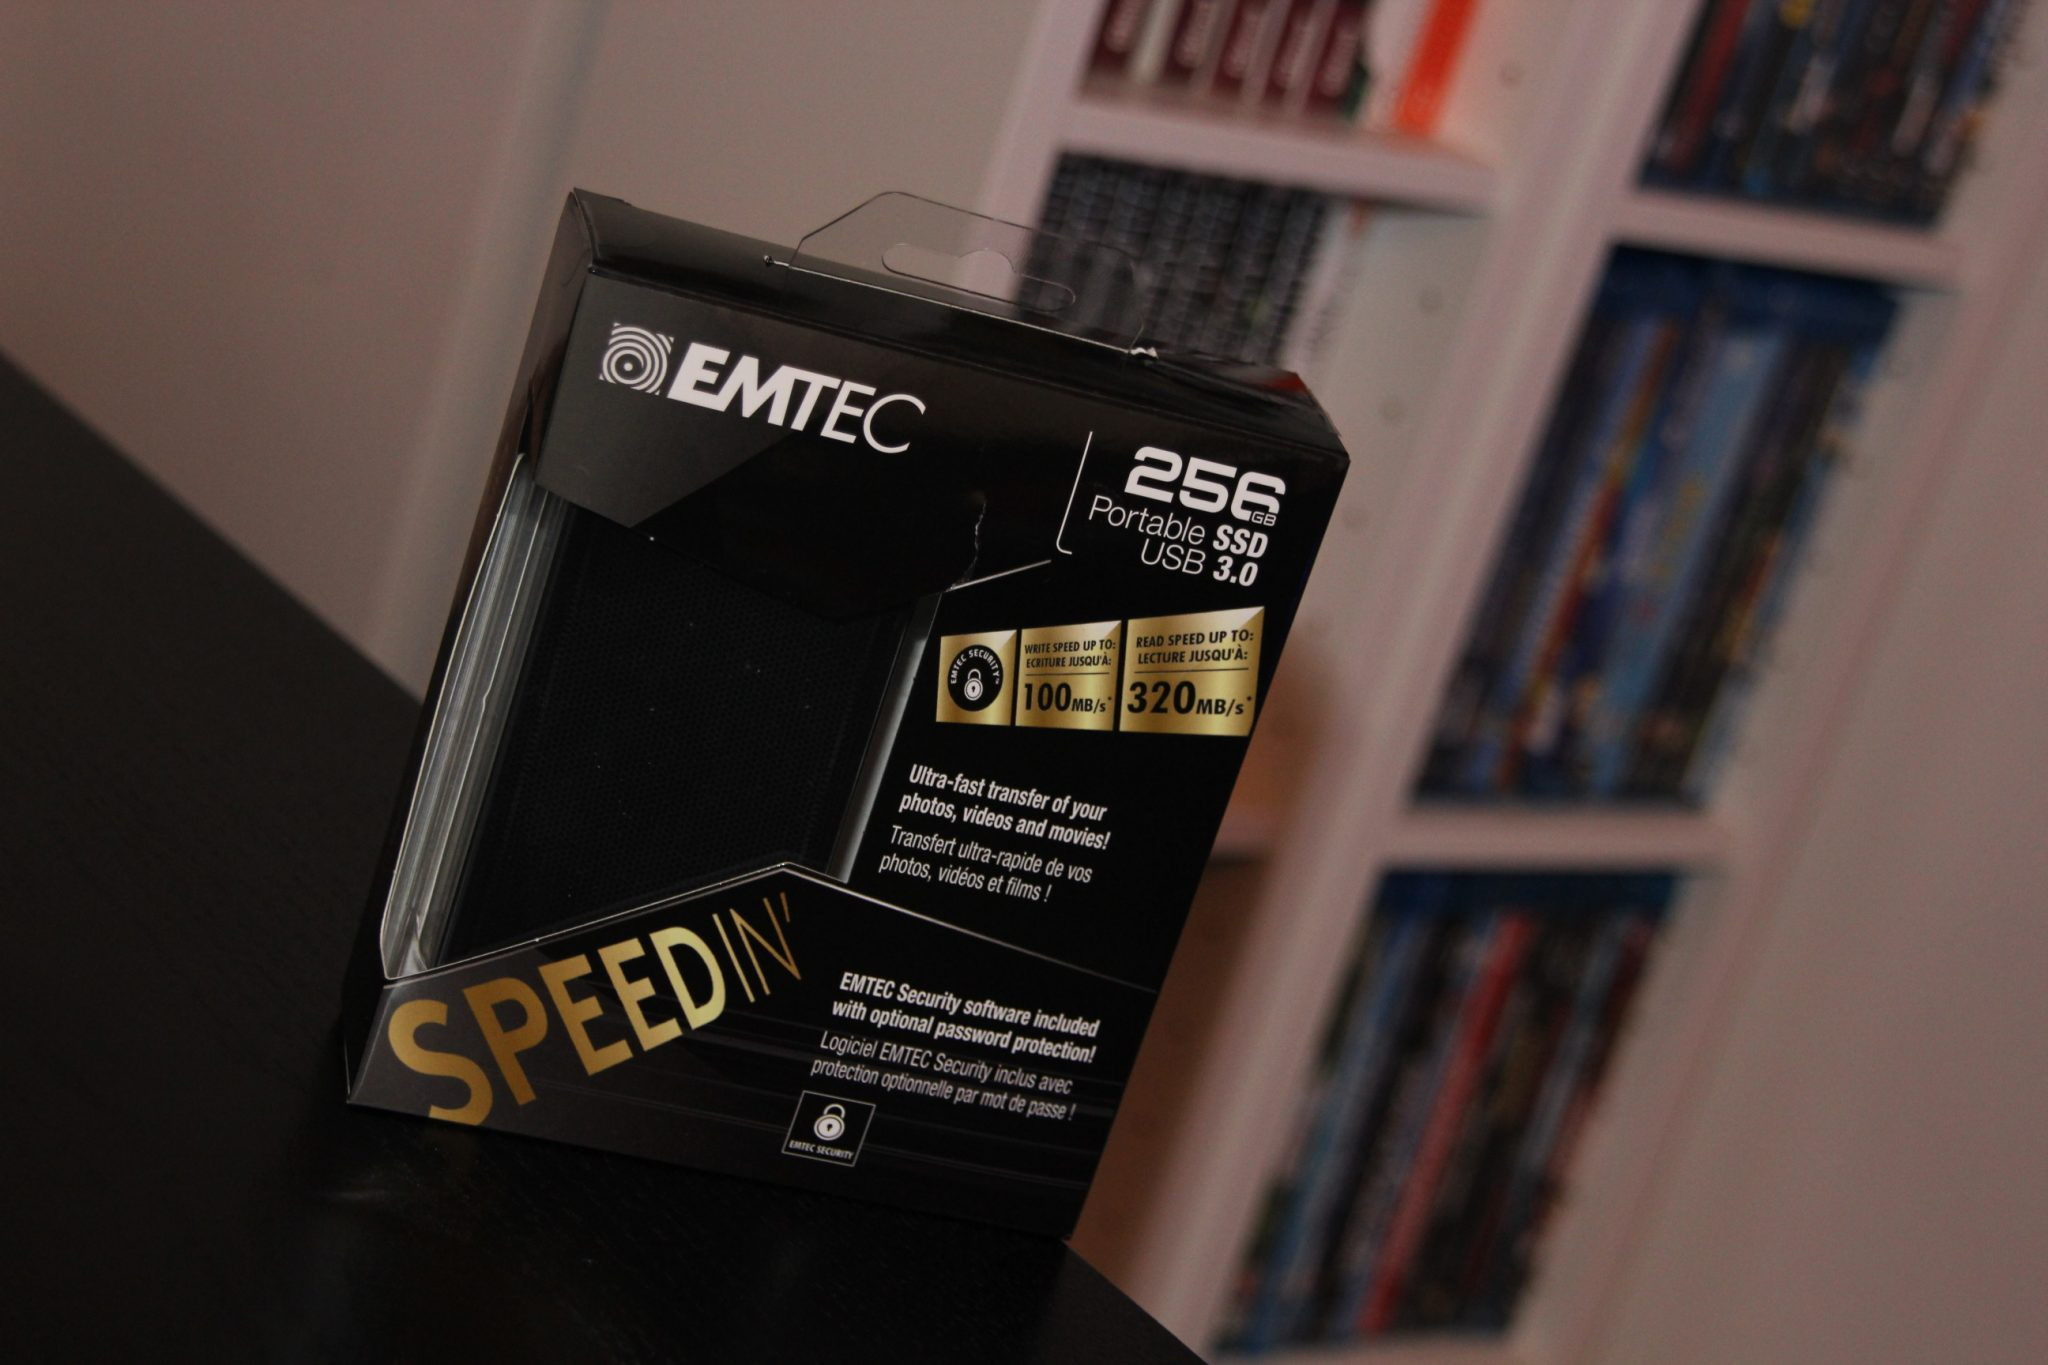 SpeedIn SSD X600 Emtec